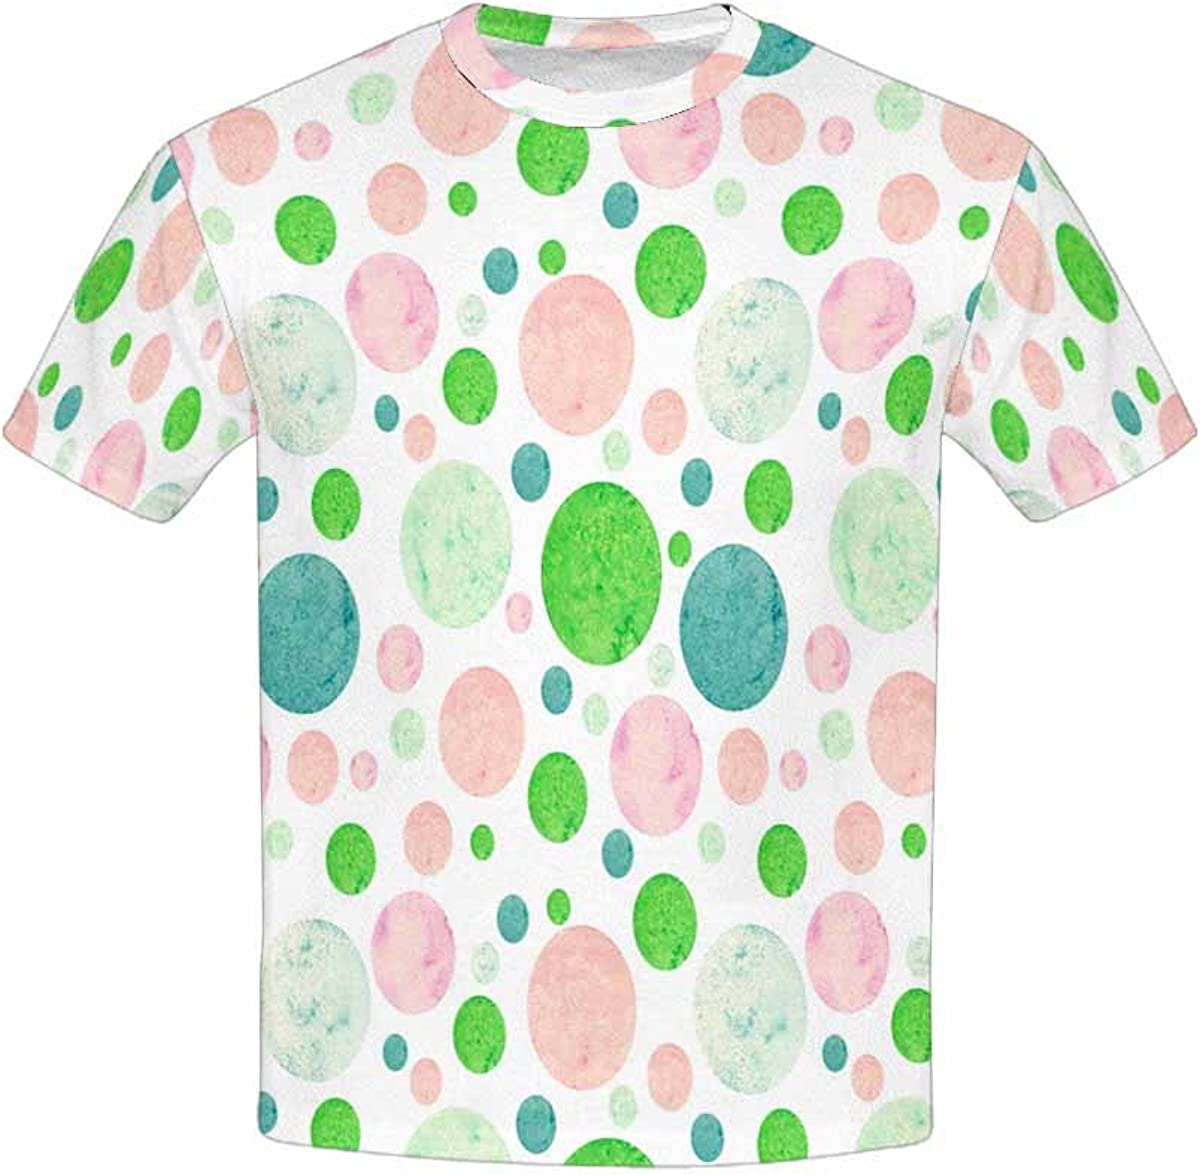 XS-XL INTERESTPRINT Youth Crew Neck T-Shirt Watercolor Bright Green Blue and Pink Polka Dots